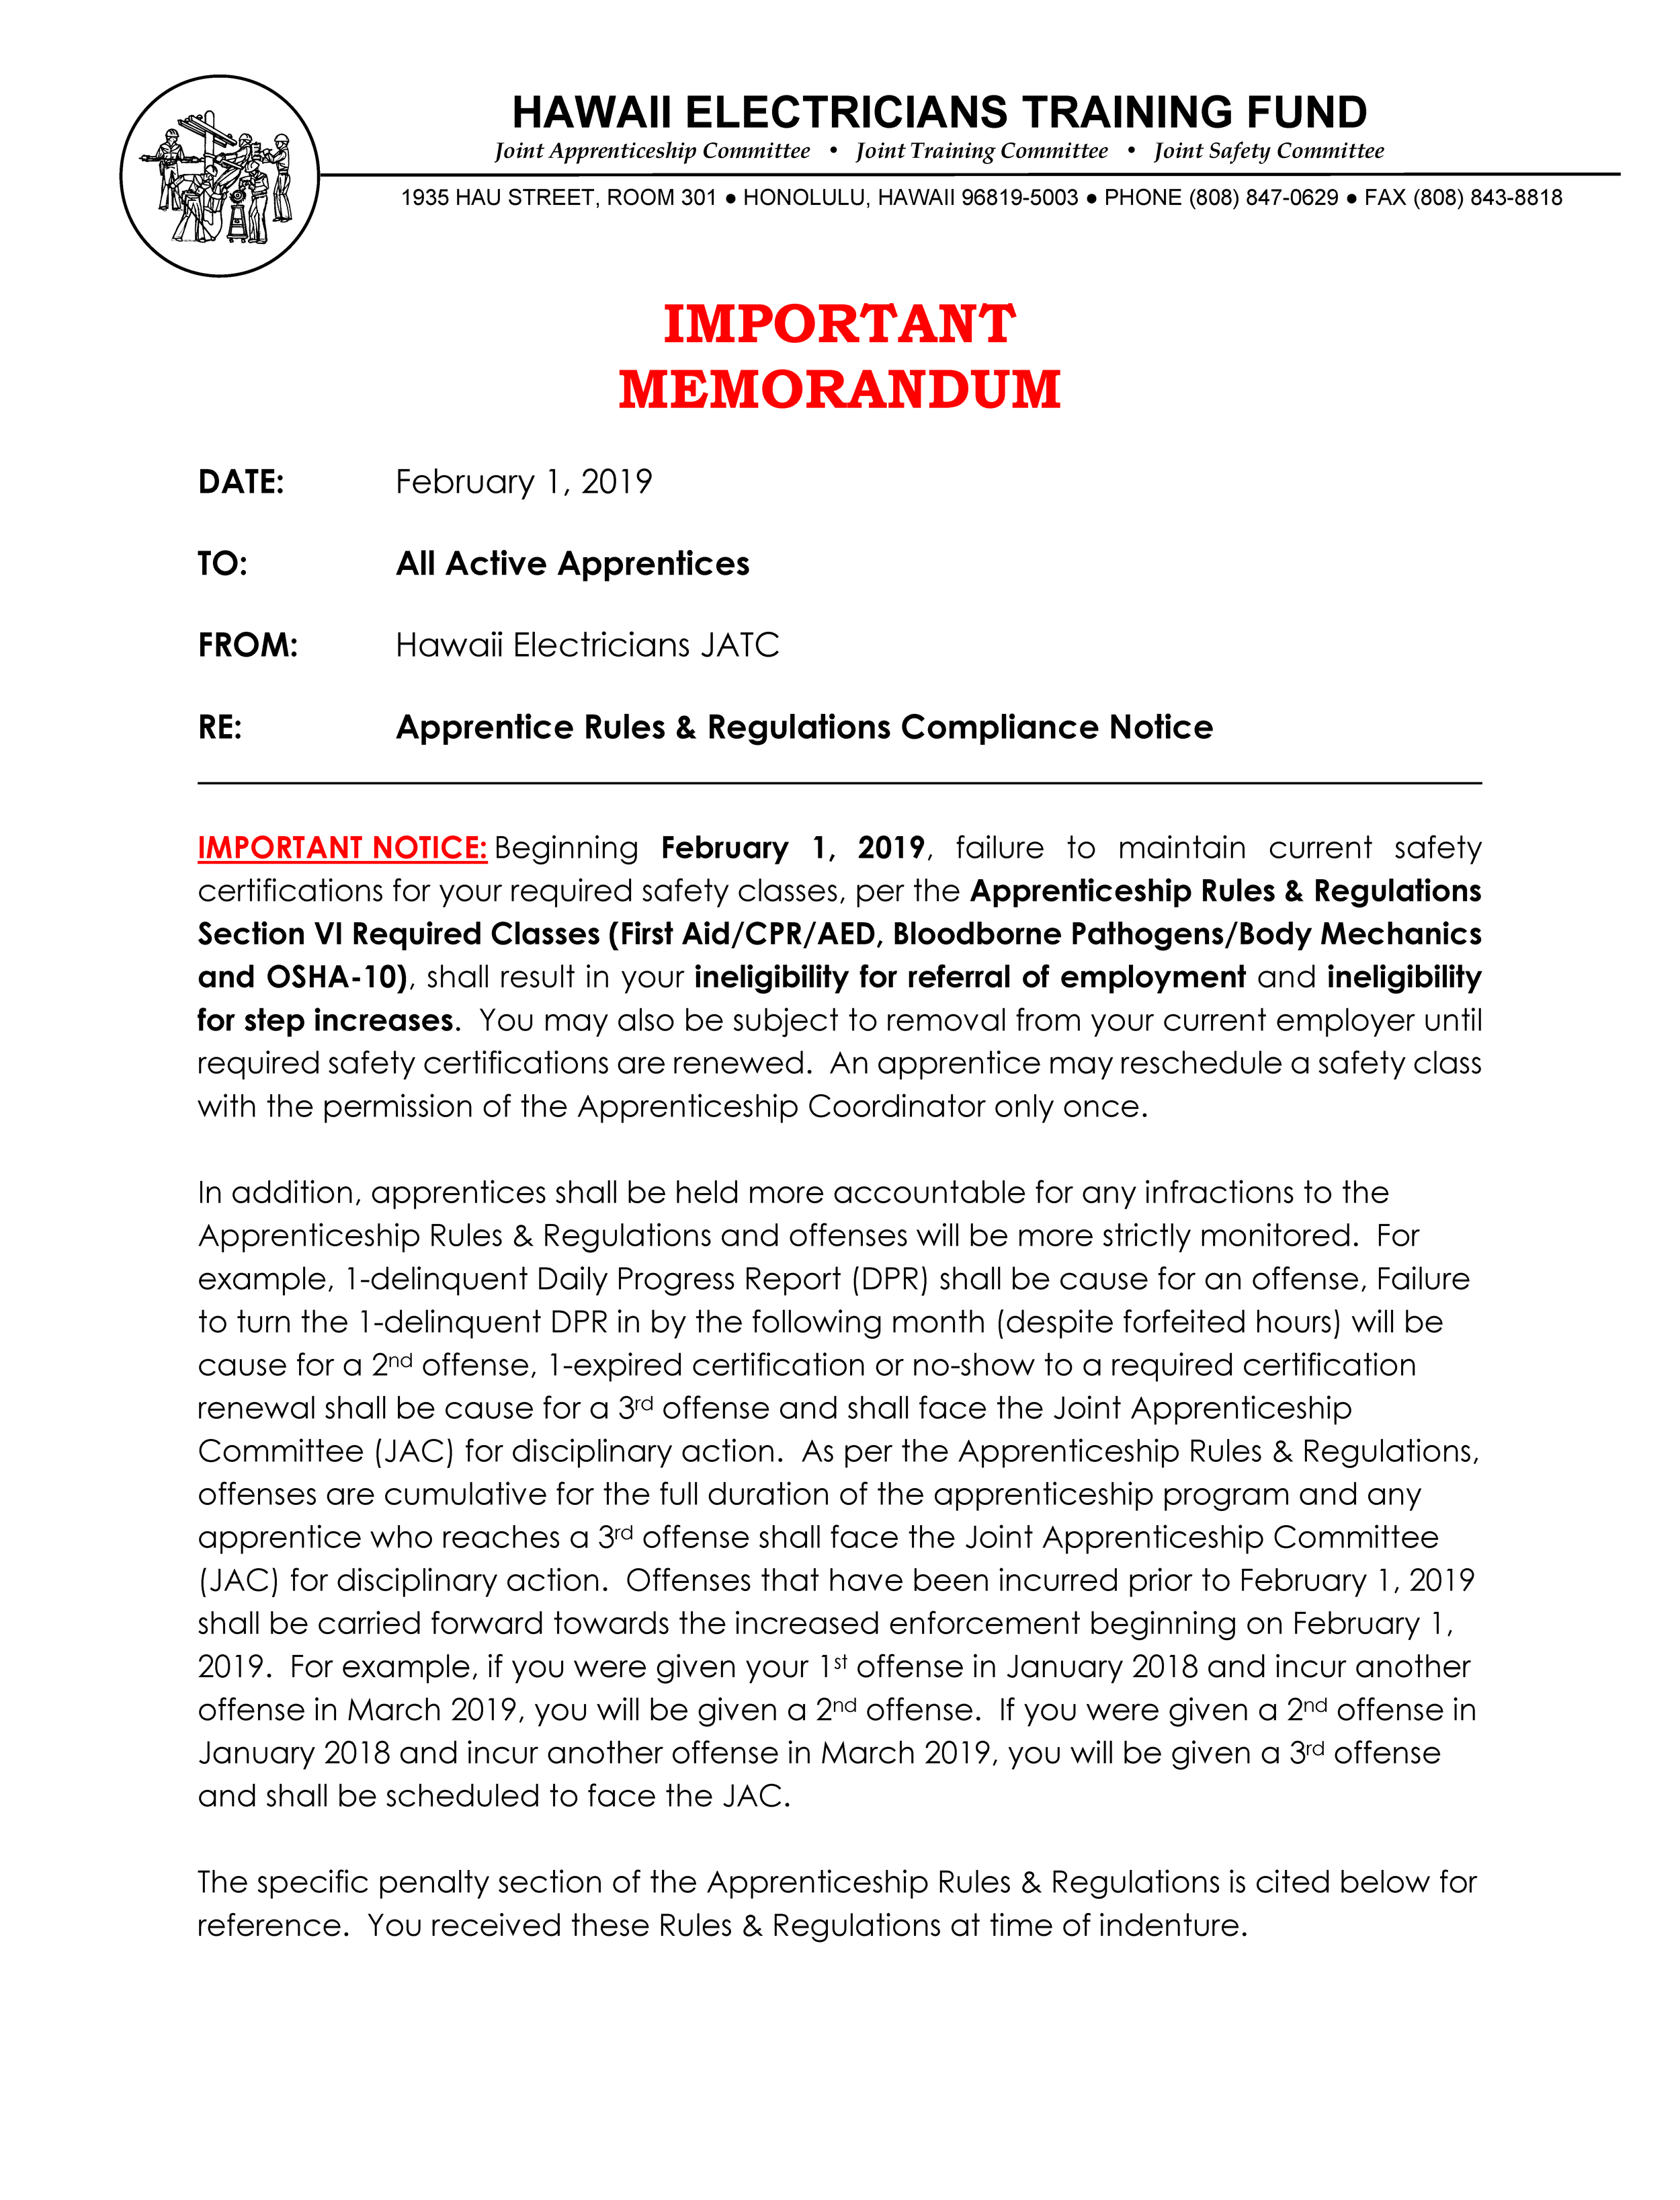 APPRENTICE RR COMPLIANCE (REV 02-06-19)_Page_1.png